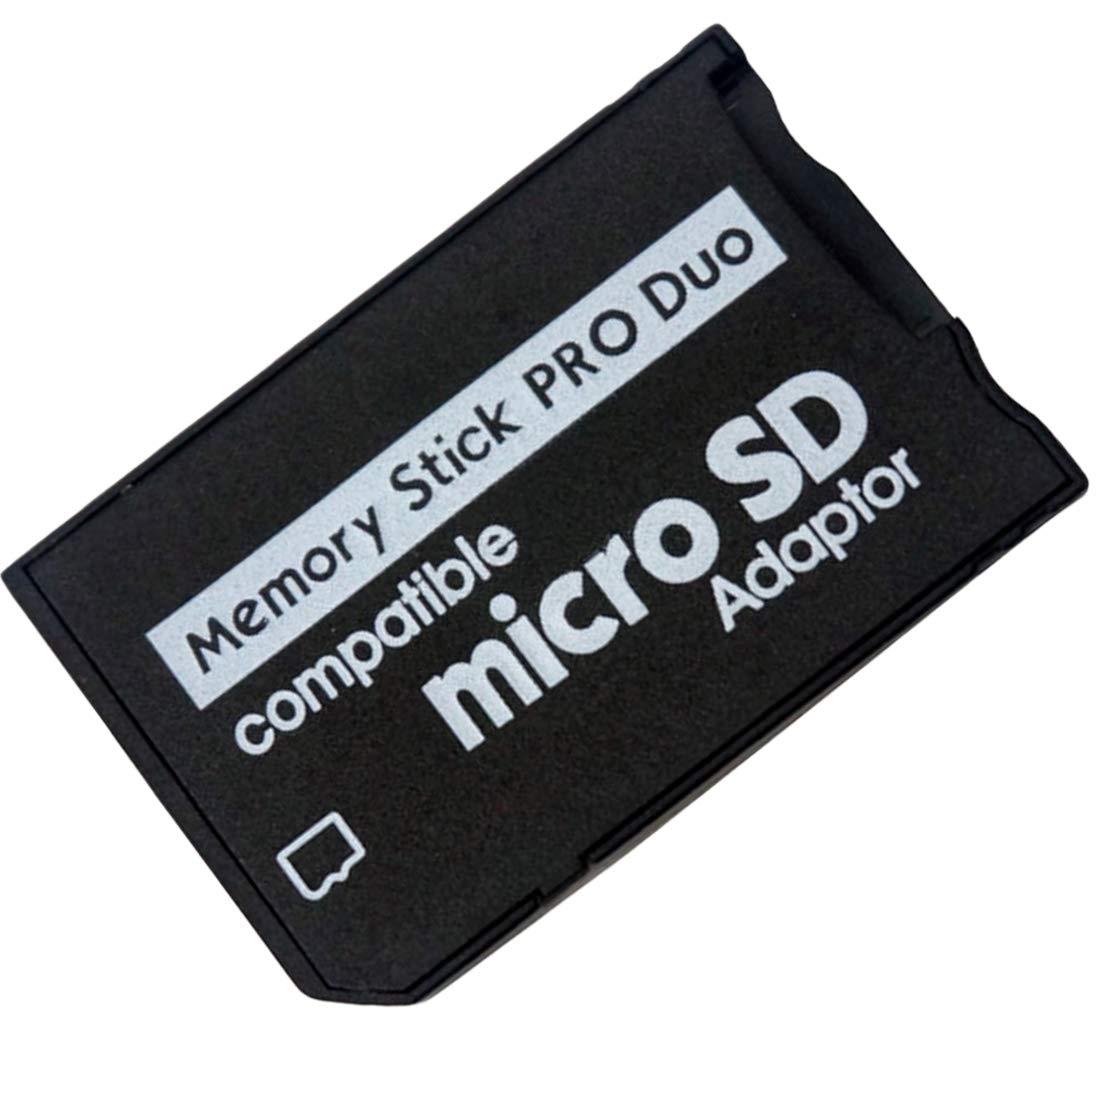 Adaptador de tarjetas de memoria Micro SD adaptador de Memory Stick PRO Duo TF a MS Tools